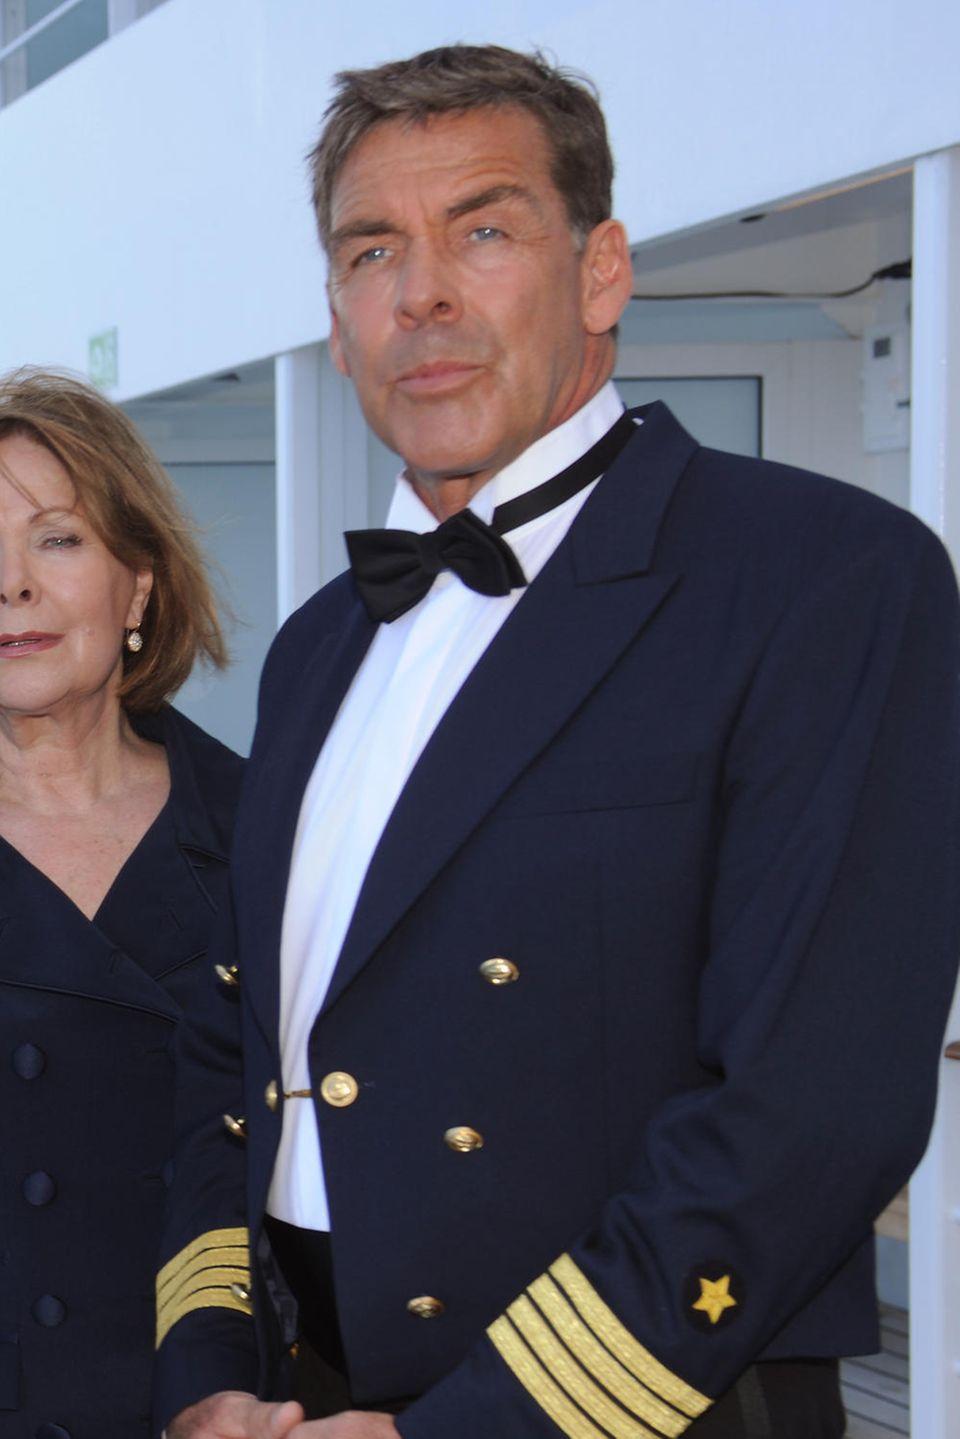 Sascha Hehn mit seiner ehemaligen Kollegin Heide Keller